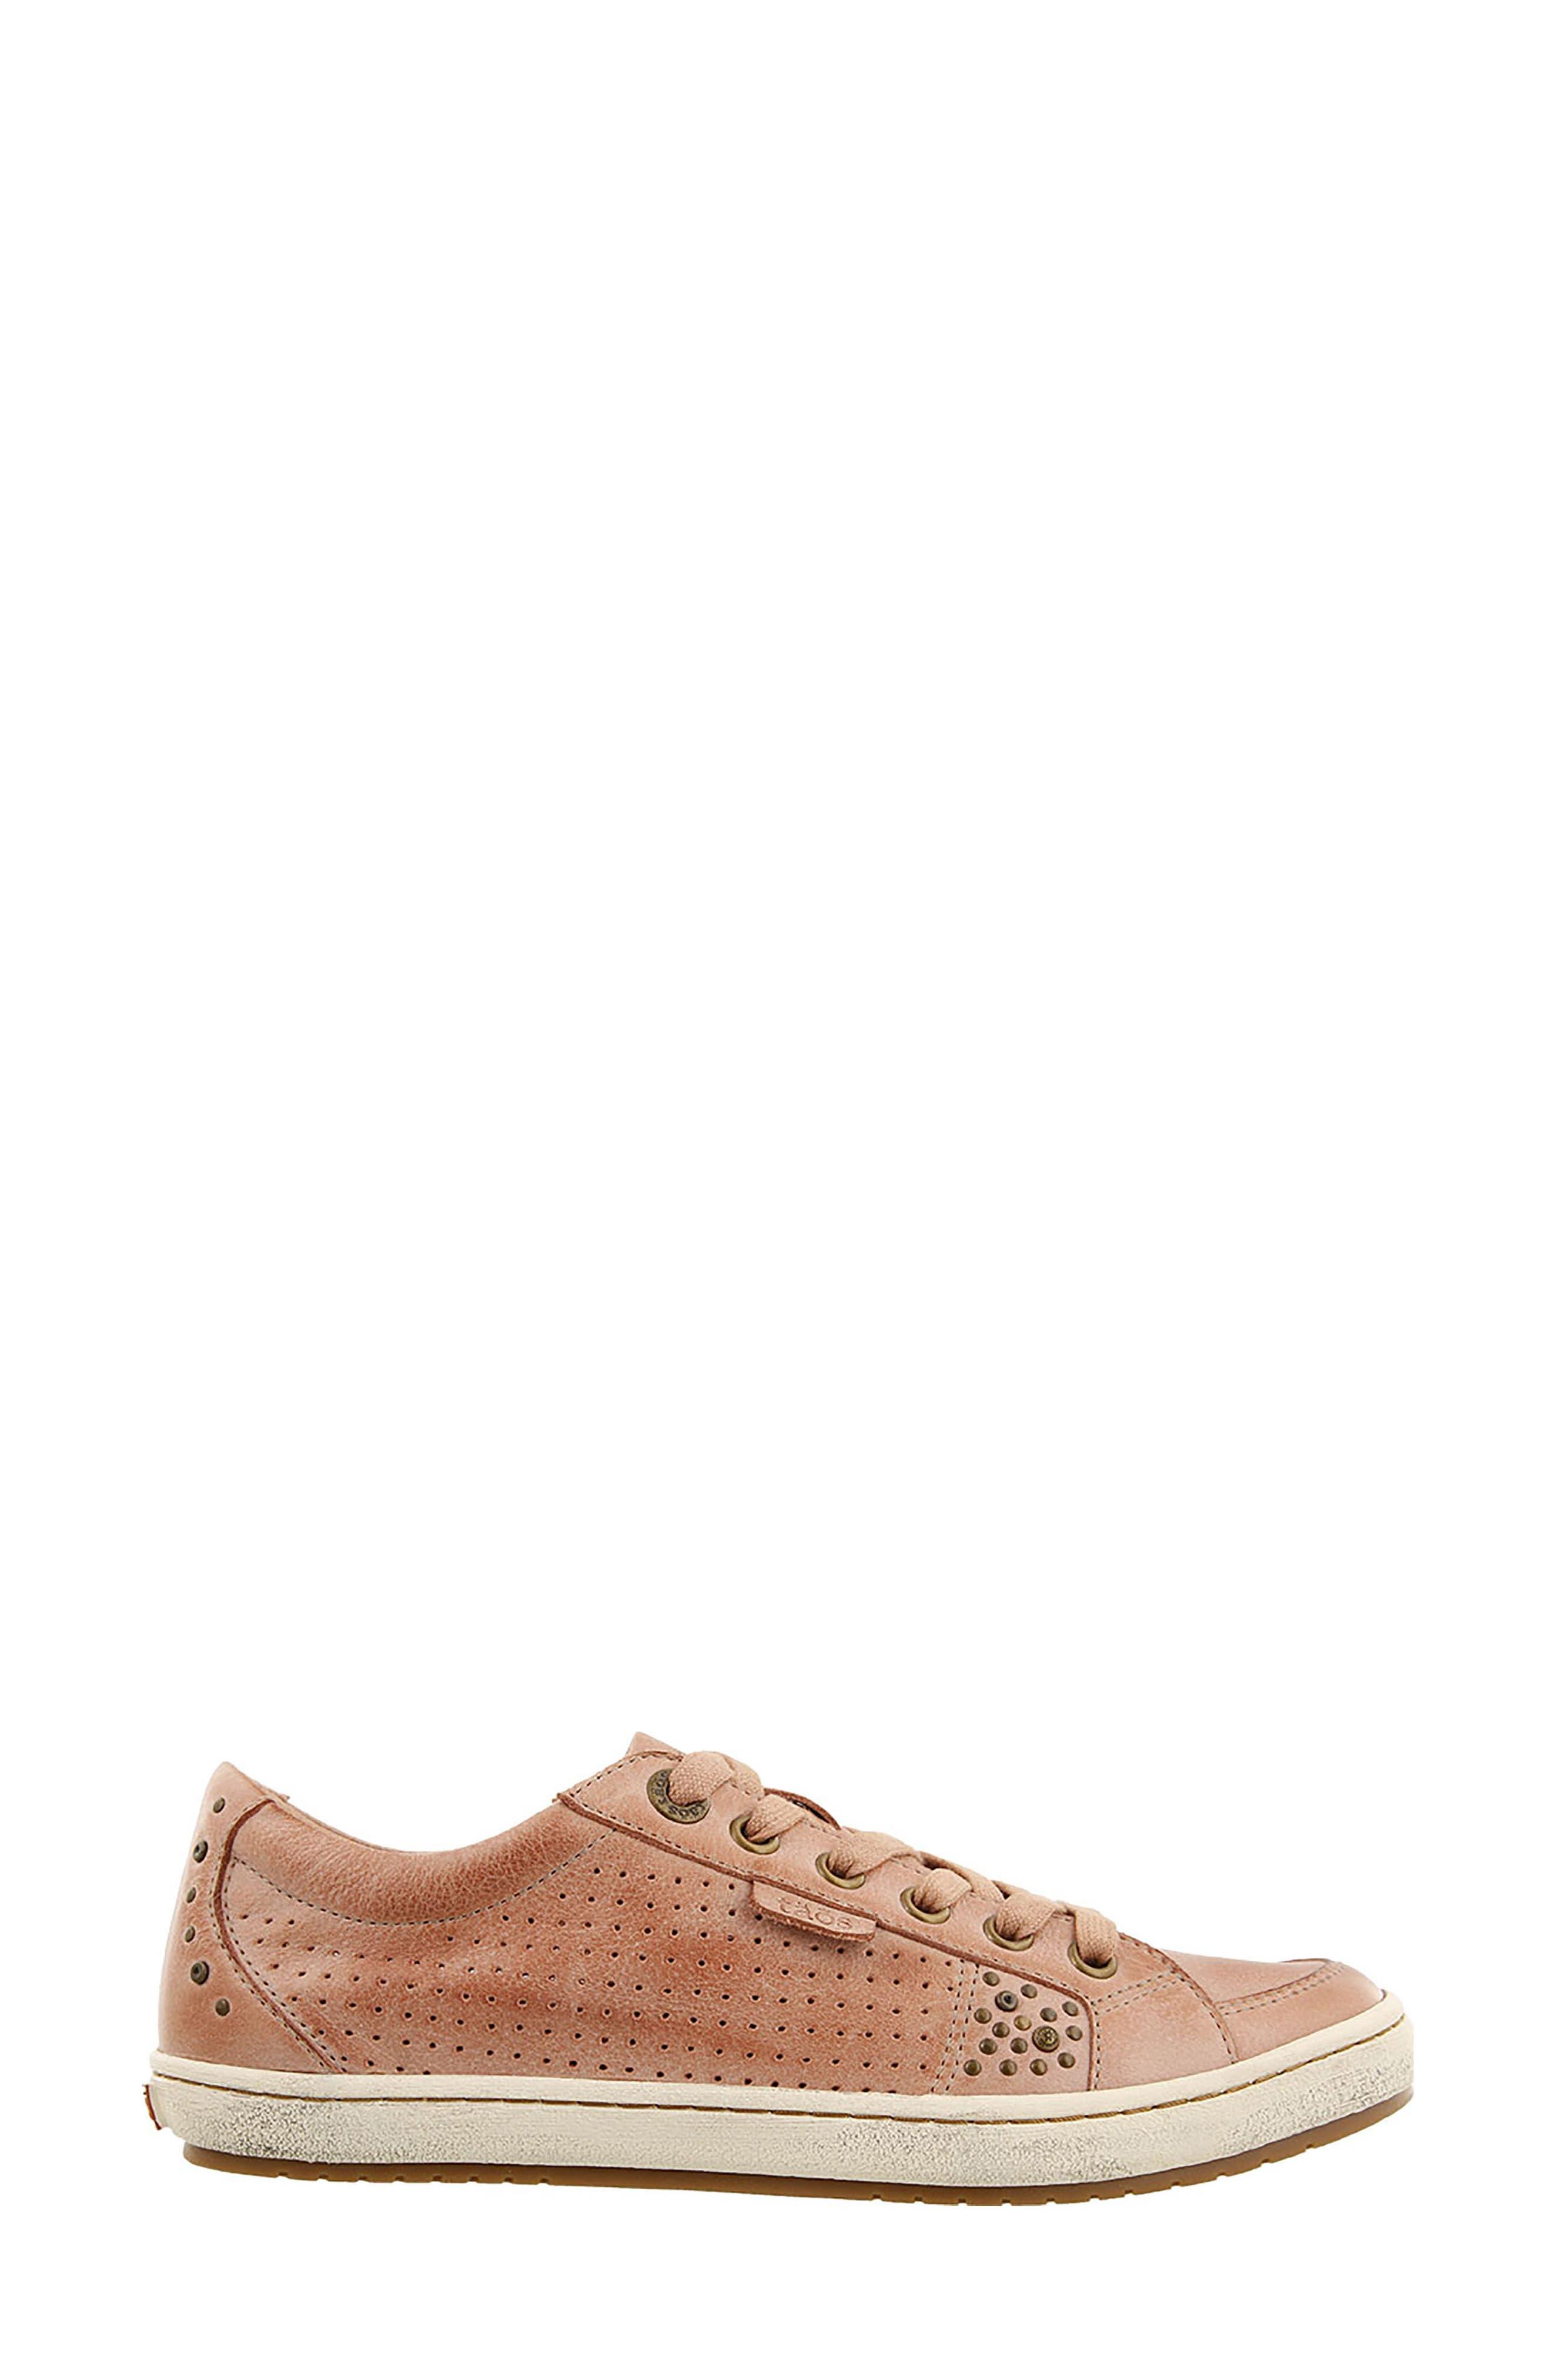 'Freedom' Sneaker,                             Alternate thumbnail 3, color,                             Blush Leather